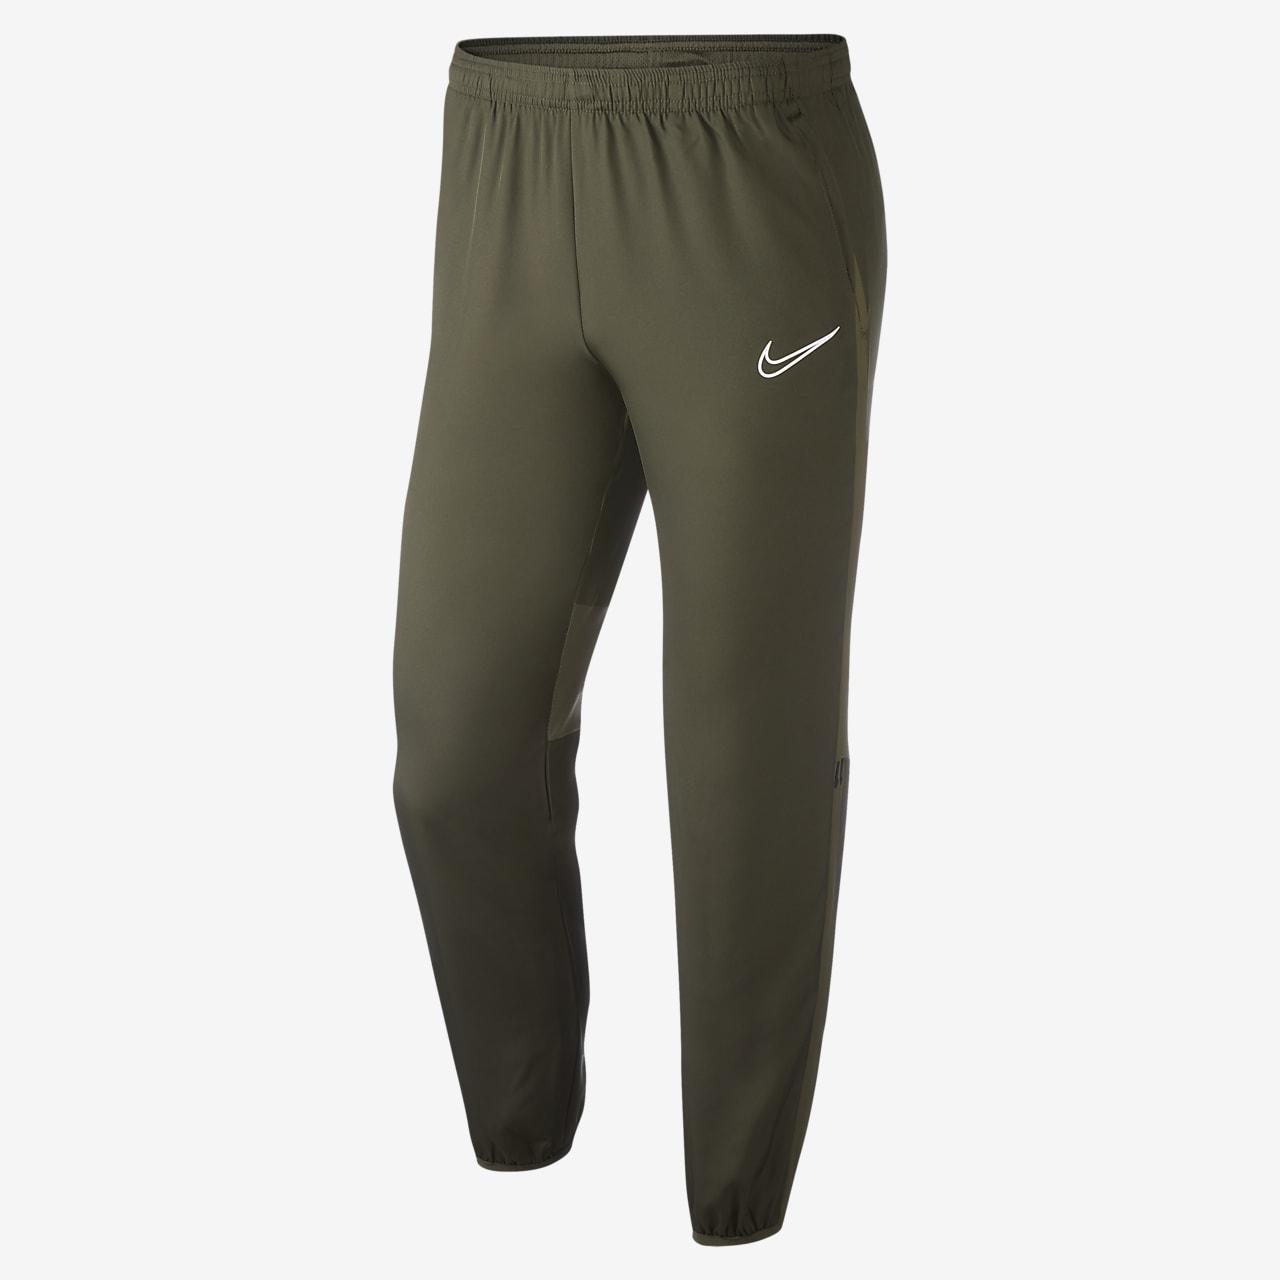 Pantaloni da calcio regolabili Nike Dri FIT Academy Uomo